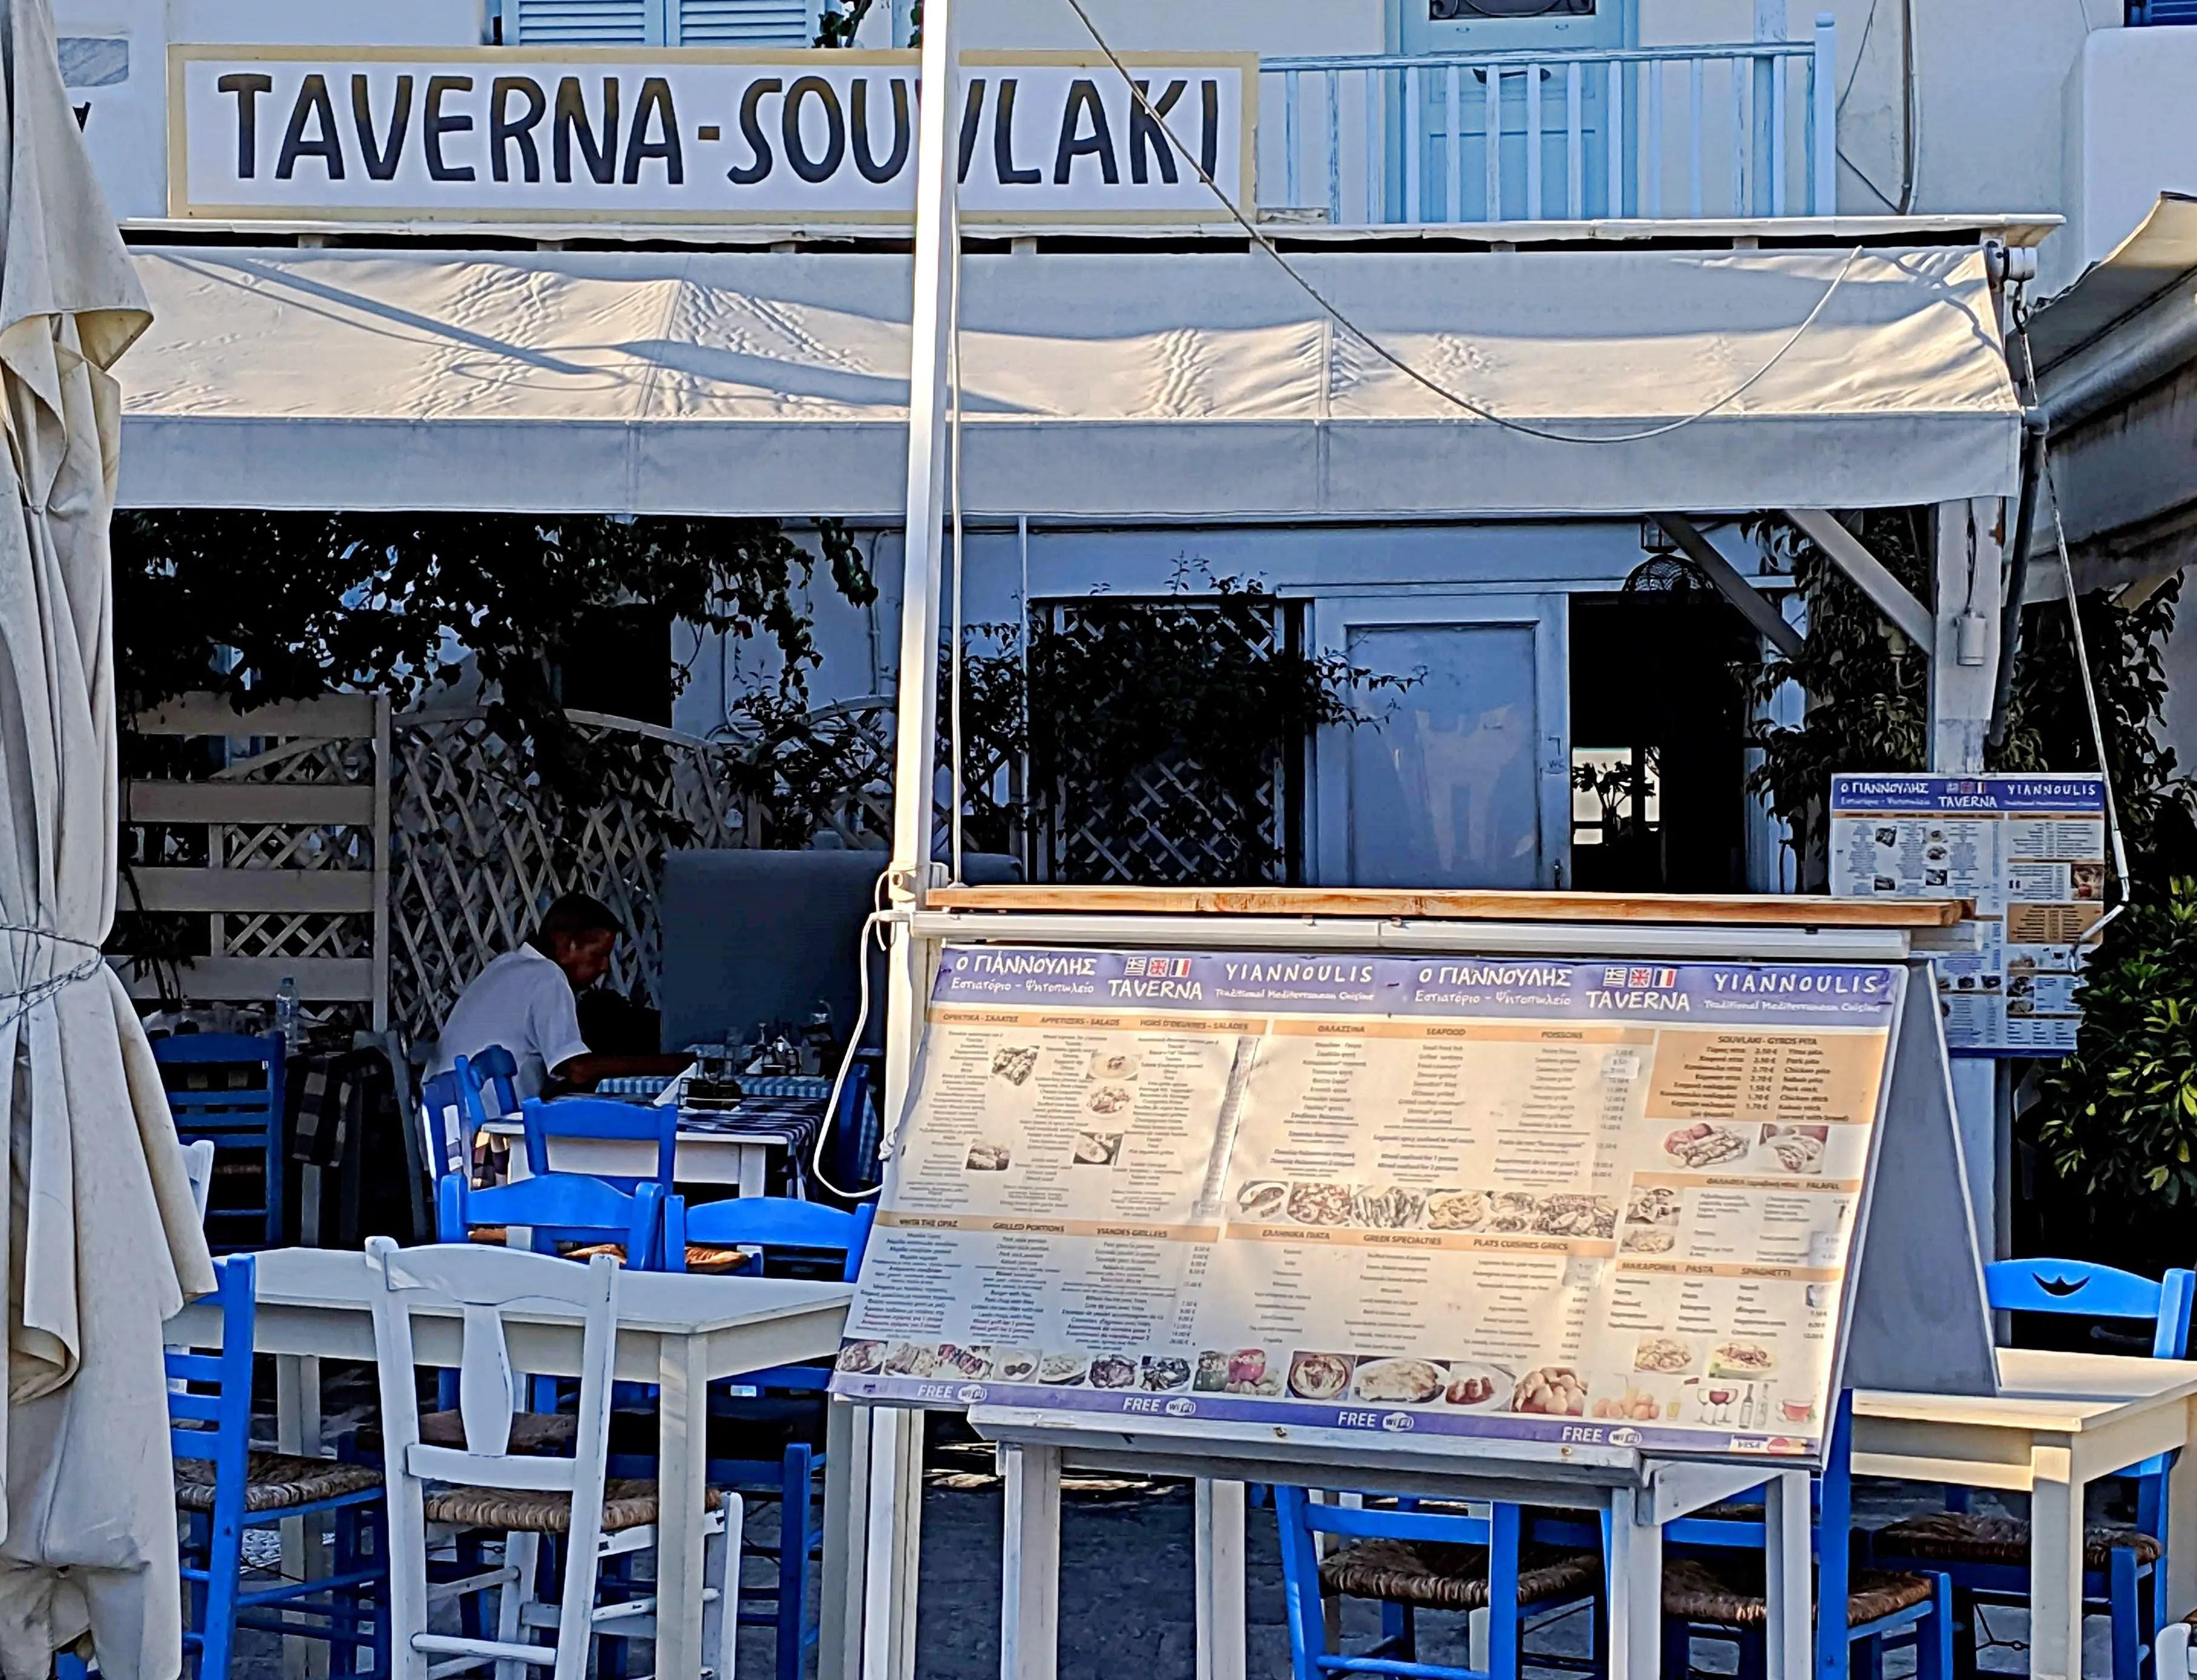 The entrance to Yiannoulis Taverna in Parikia